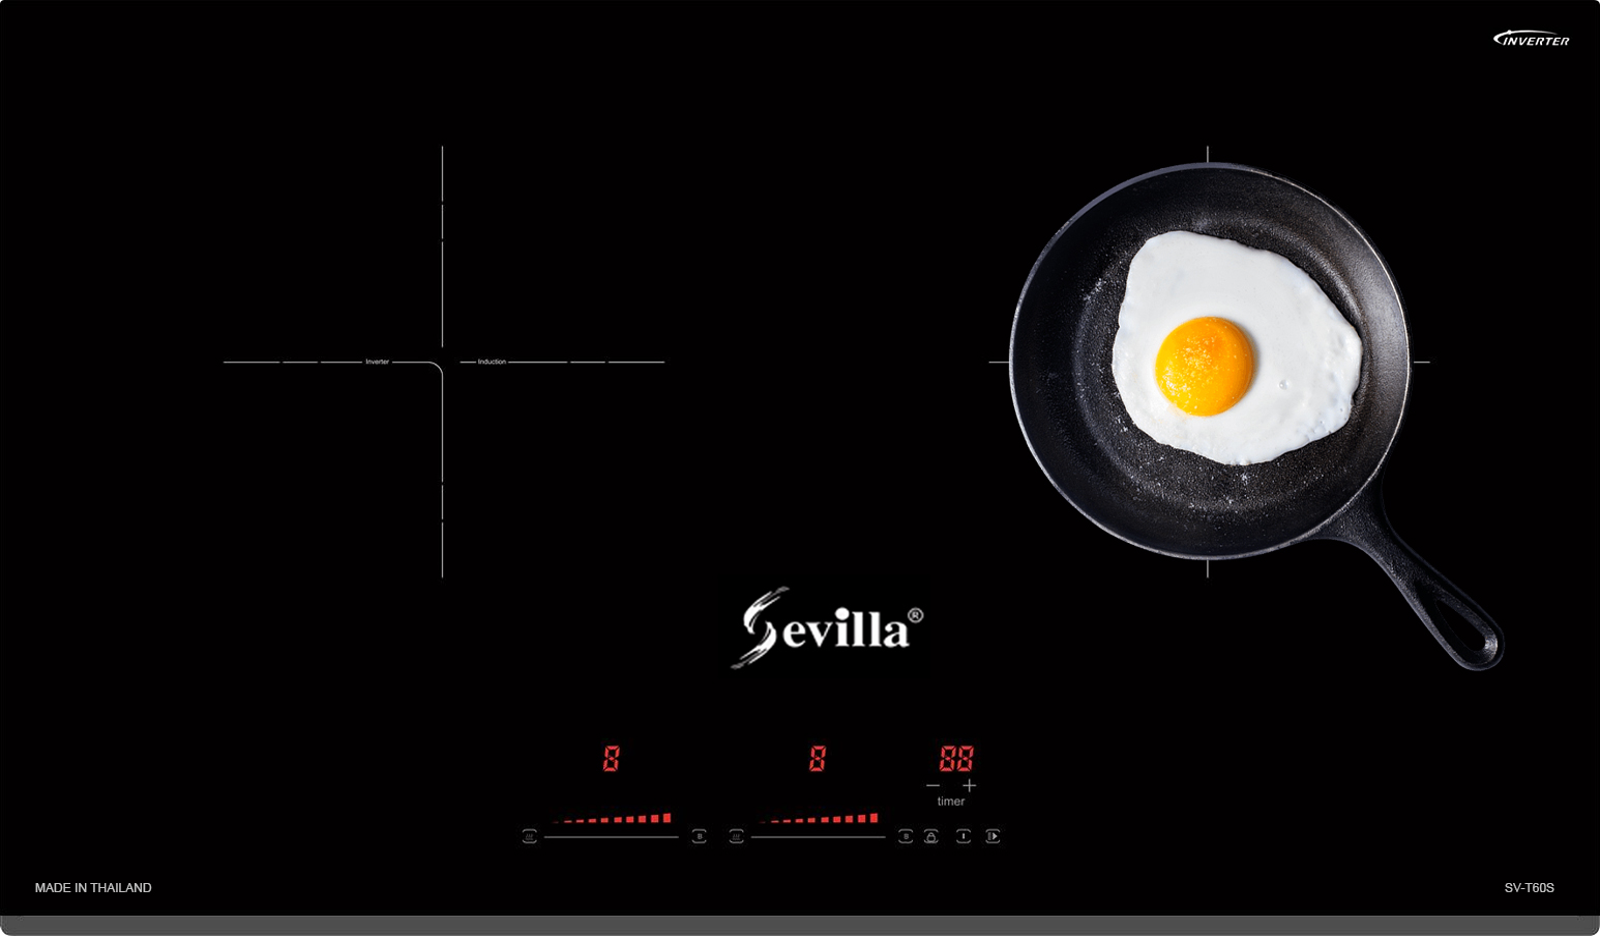 bep-tu-sevilla-sv-t60s.jpg_product